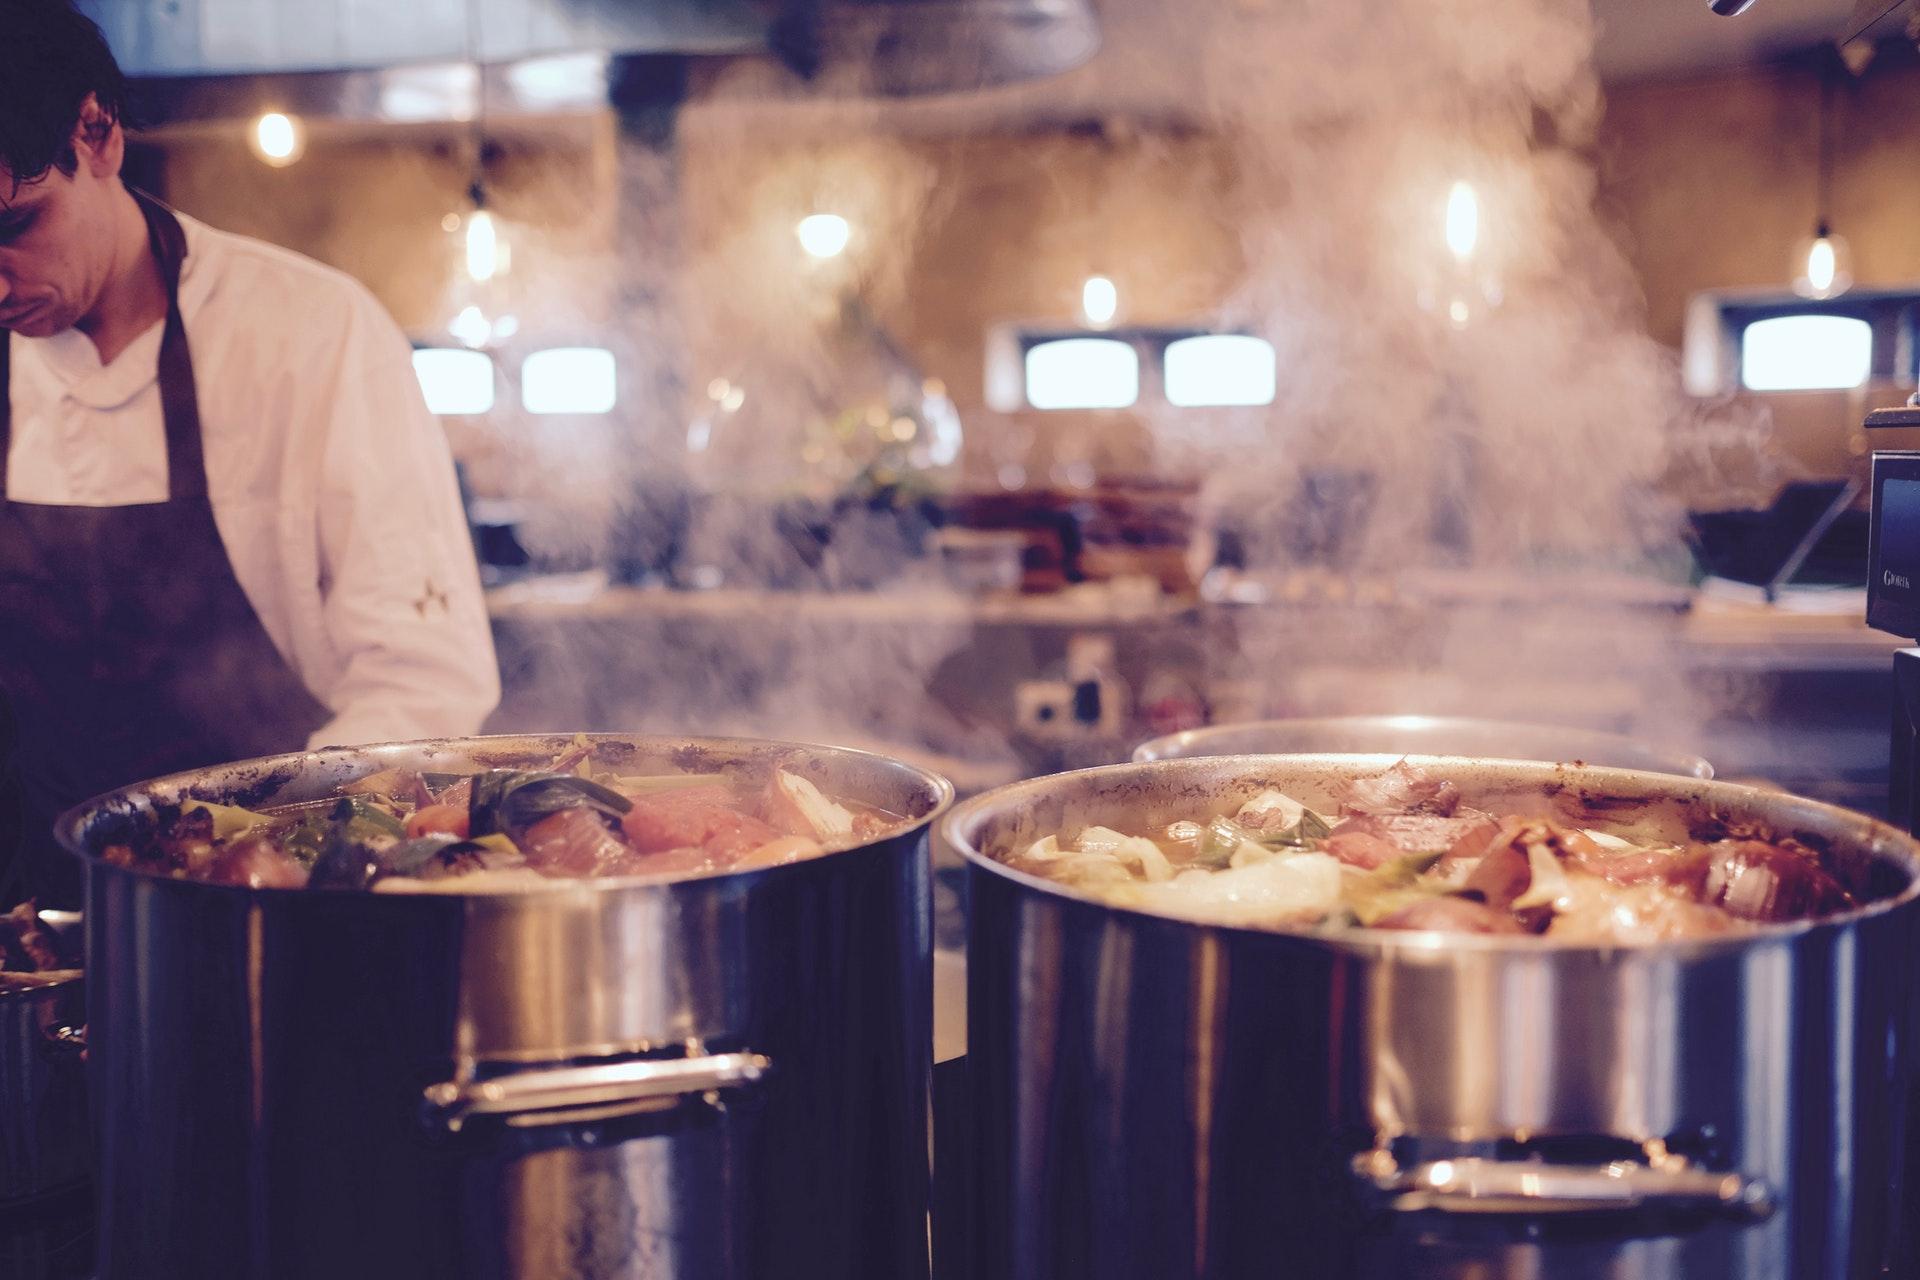 Kuchař - kuchyně - chef